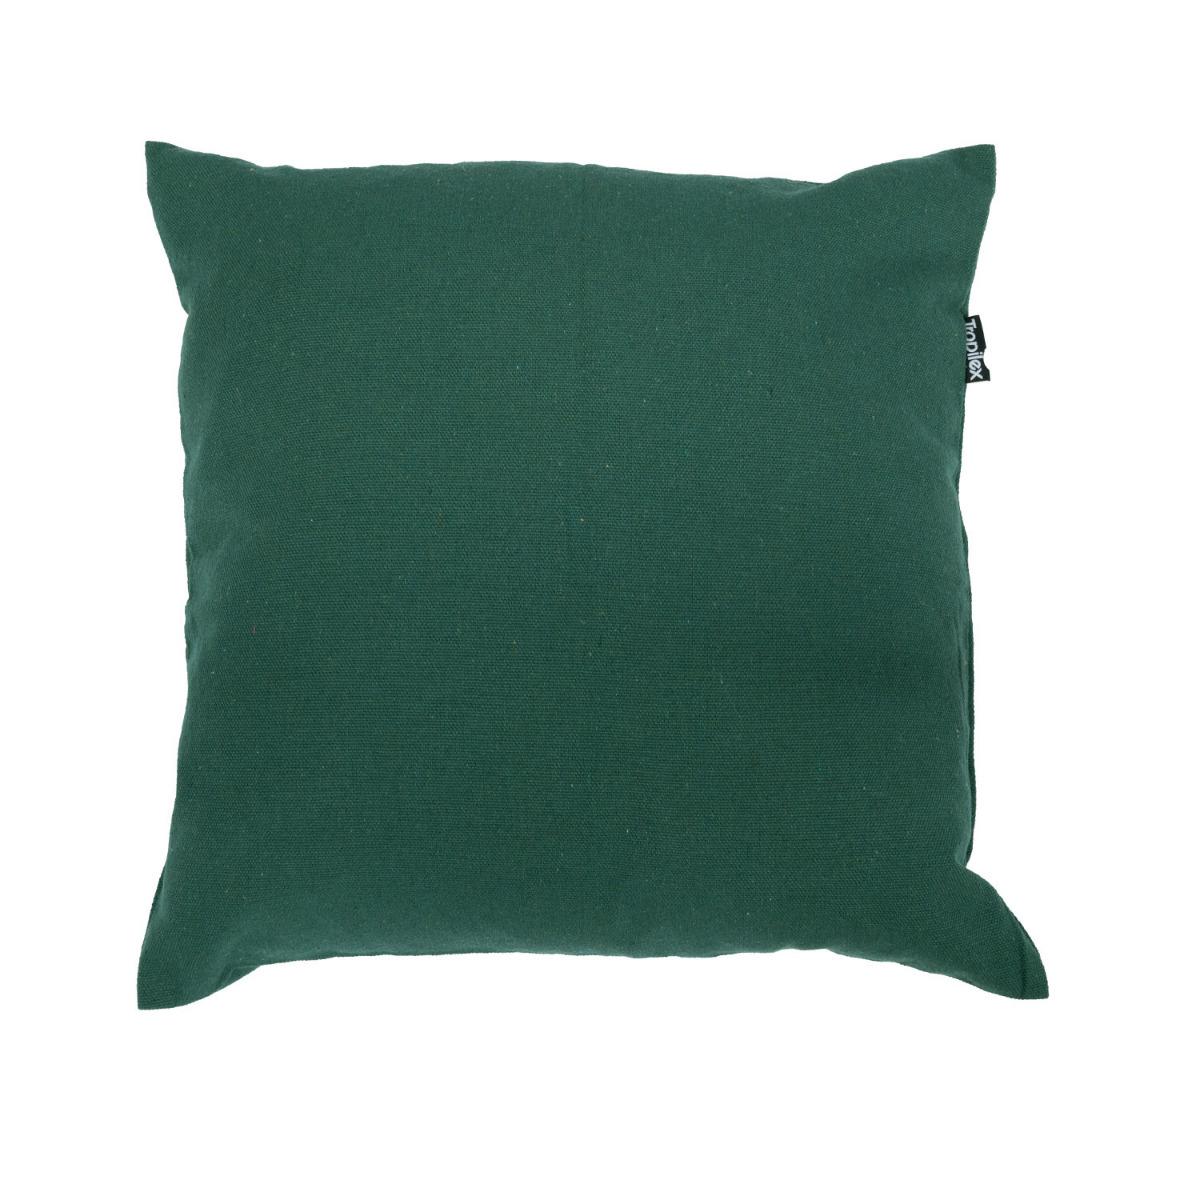 Kussen 'Plain' Green - Tropilex �